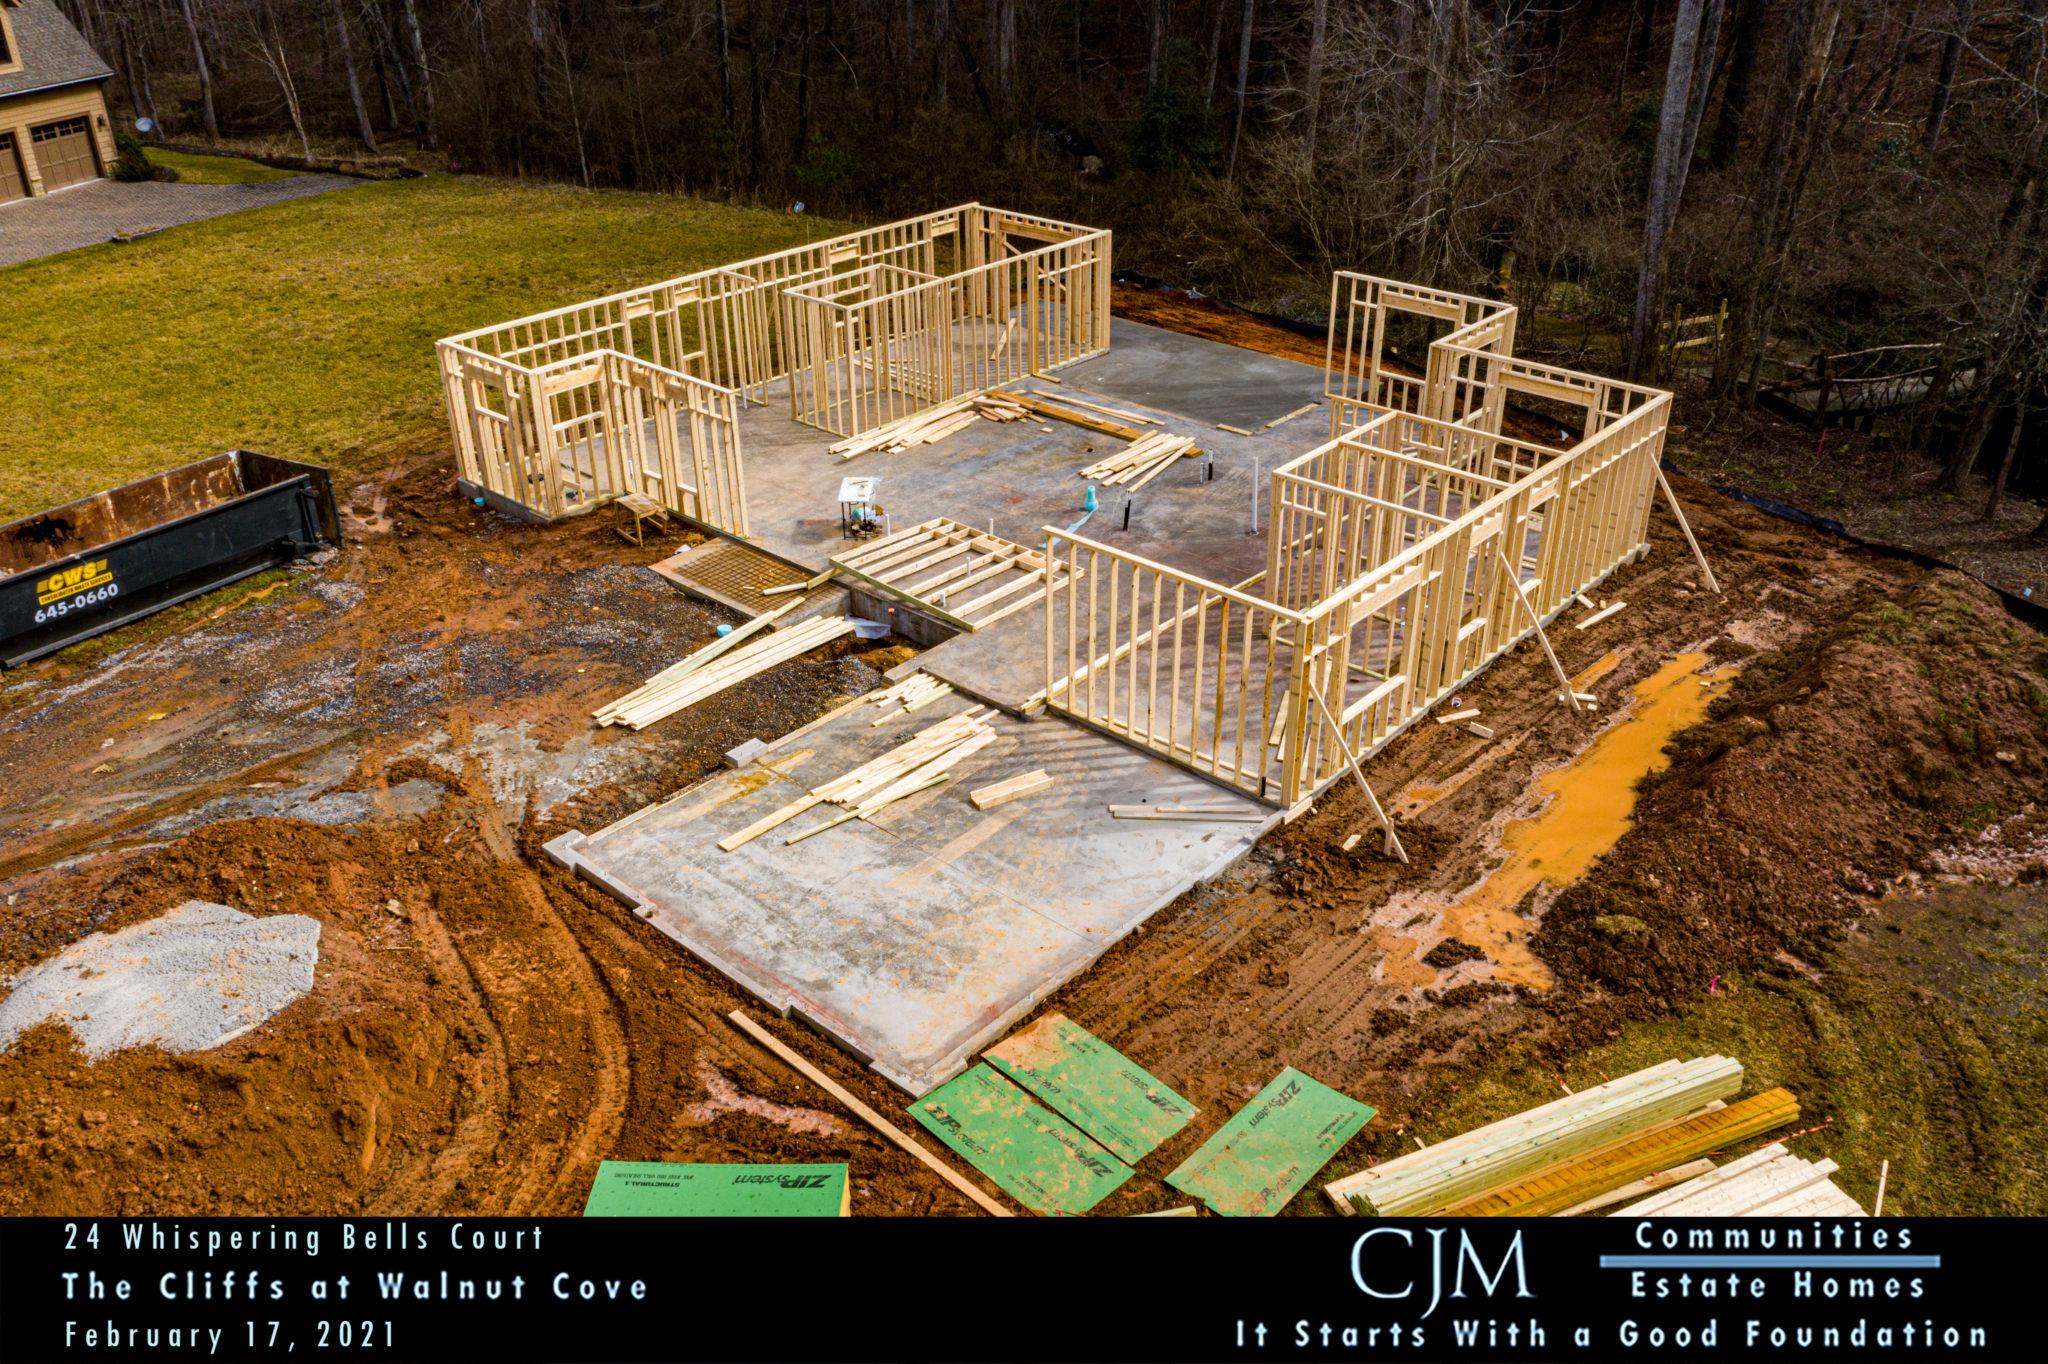 CJM Communities LLC